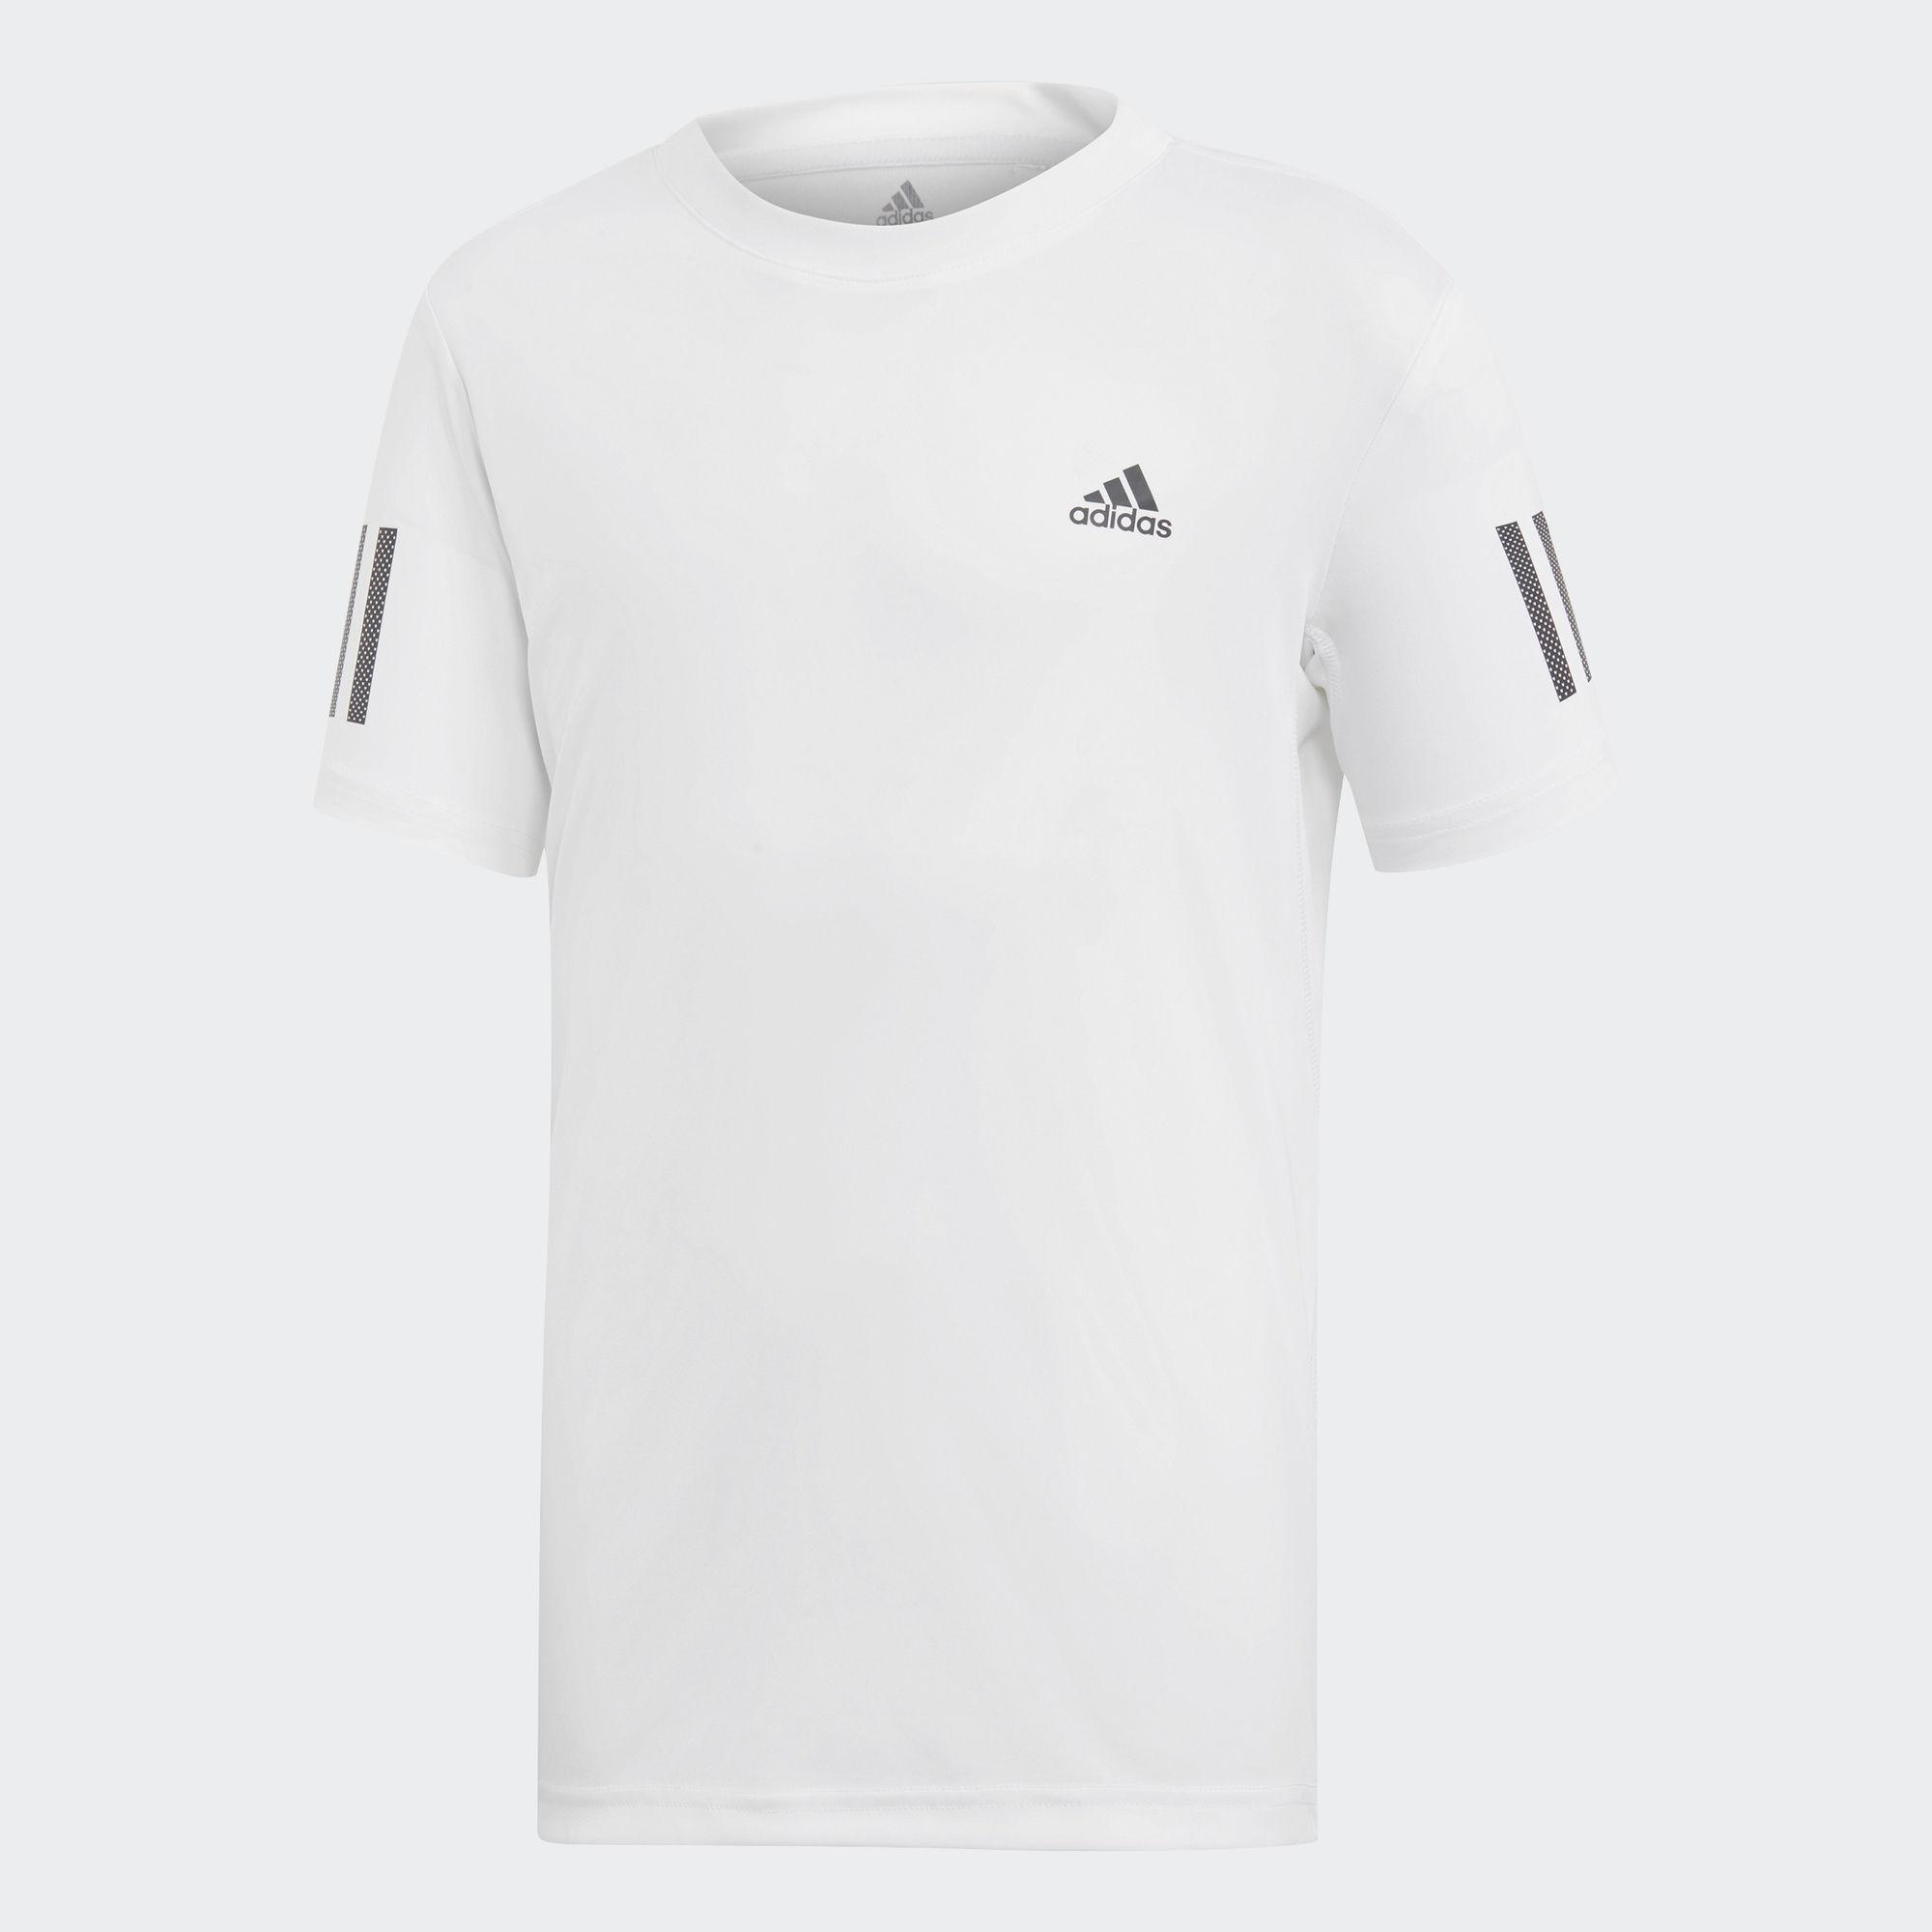 size 40 0fe64 1ee97 Adidas Boys 3-Stripes Club Tee - White - Tennisnuts.com